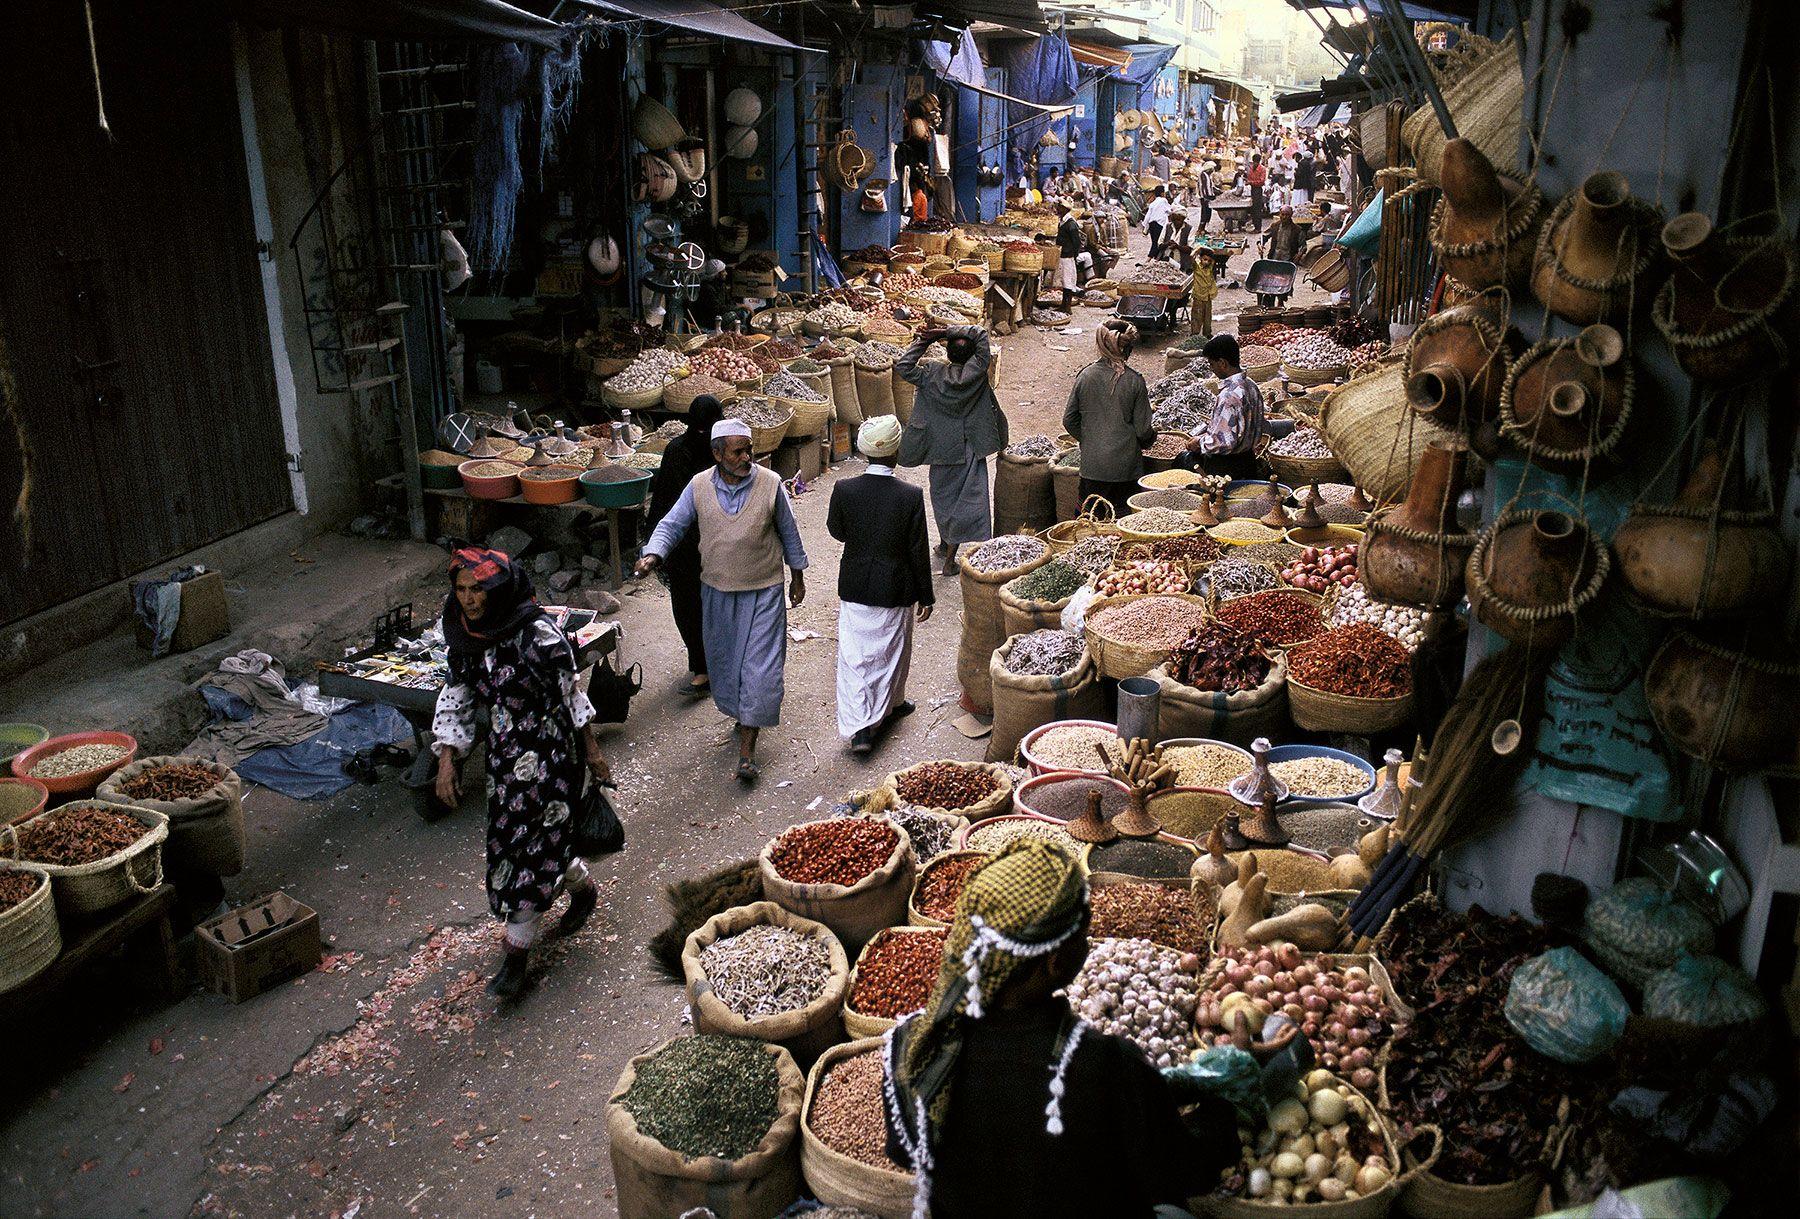 Where the World Meets | Steve McCurry Yemen